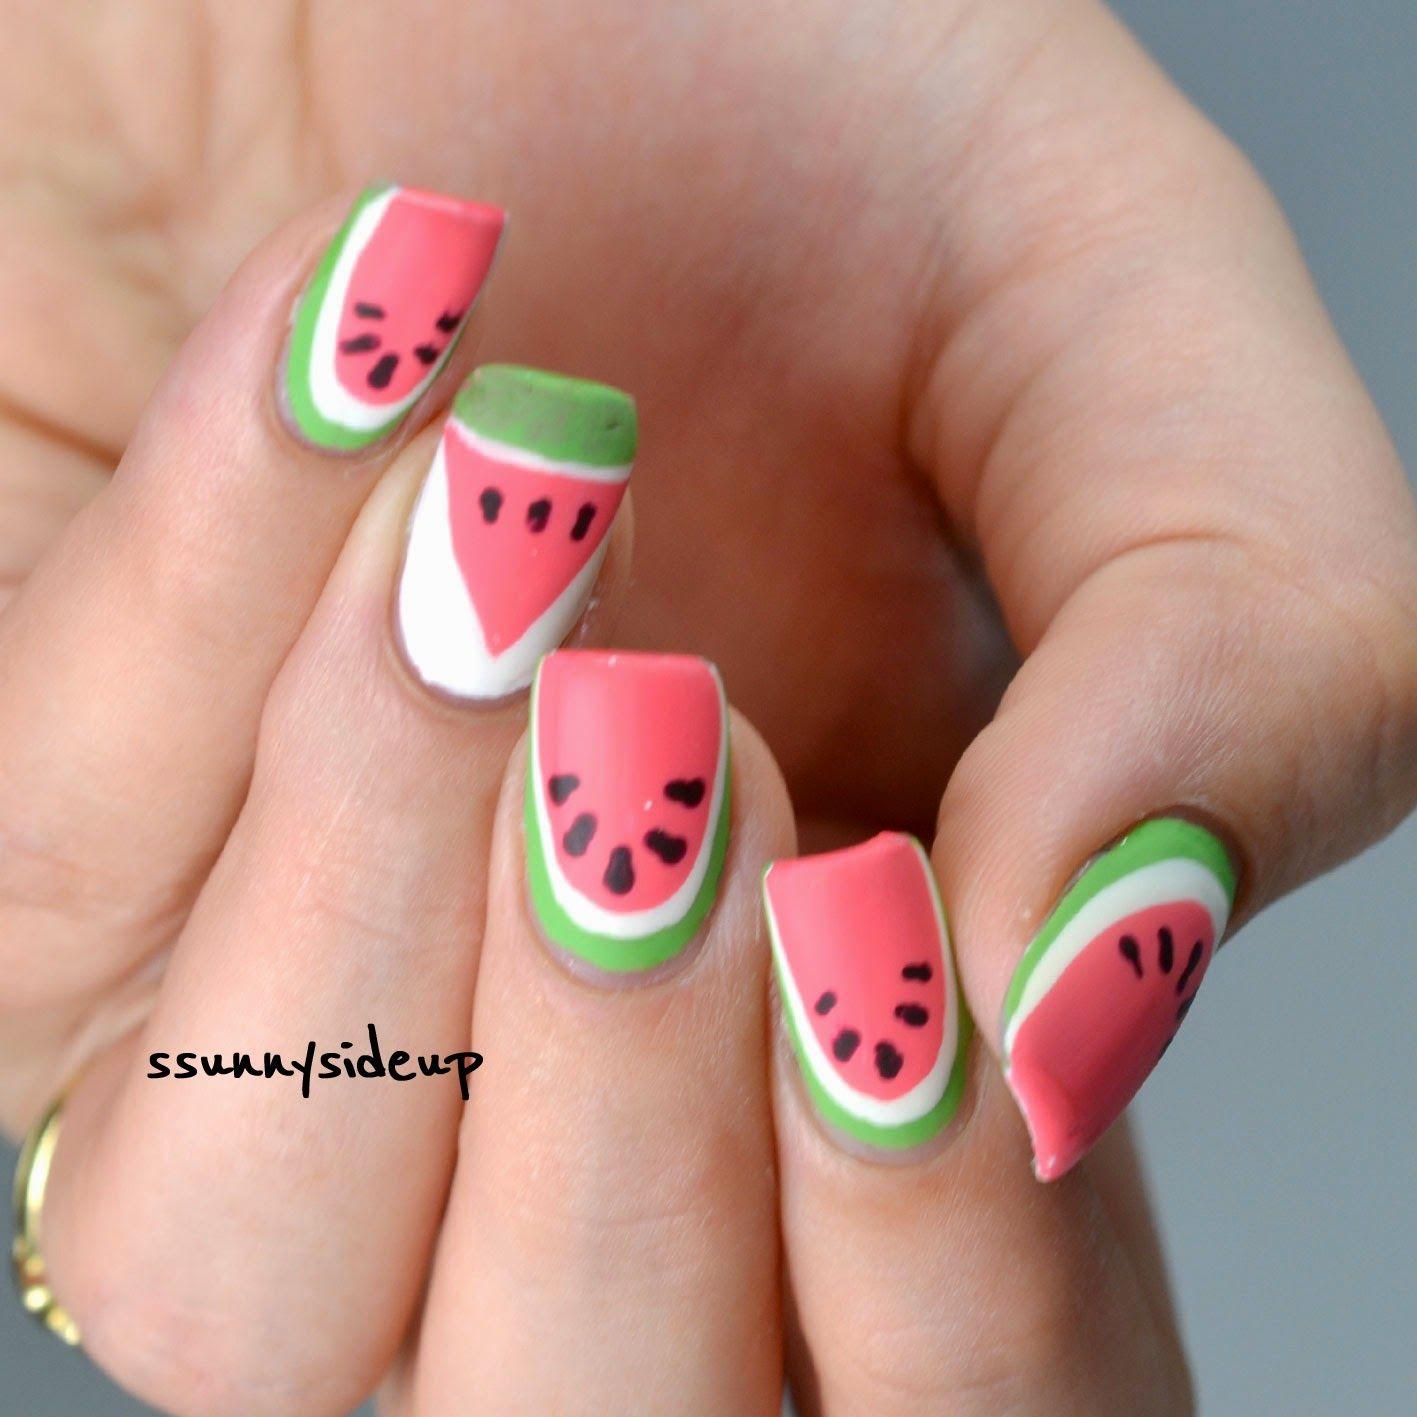 Ssunnysideup Watermelon Nails With Sally Hansen, Catrice, Essie, Essence And